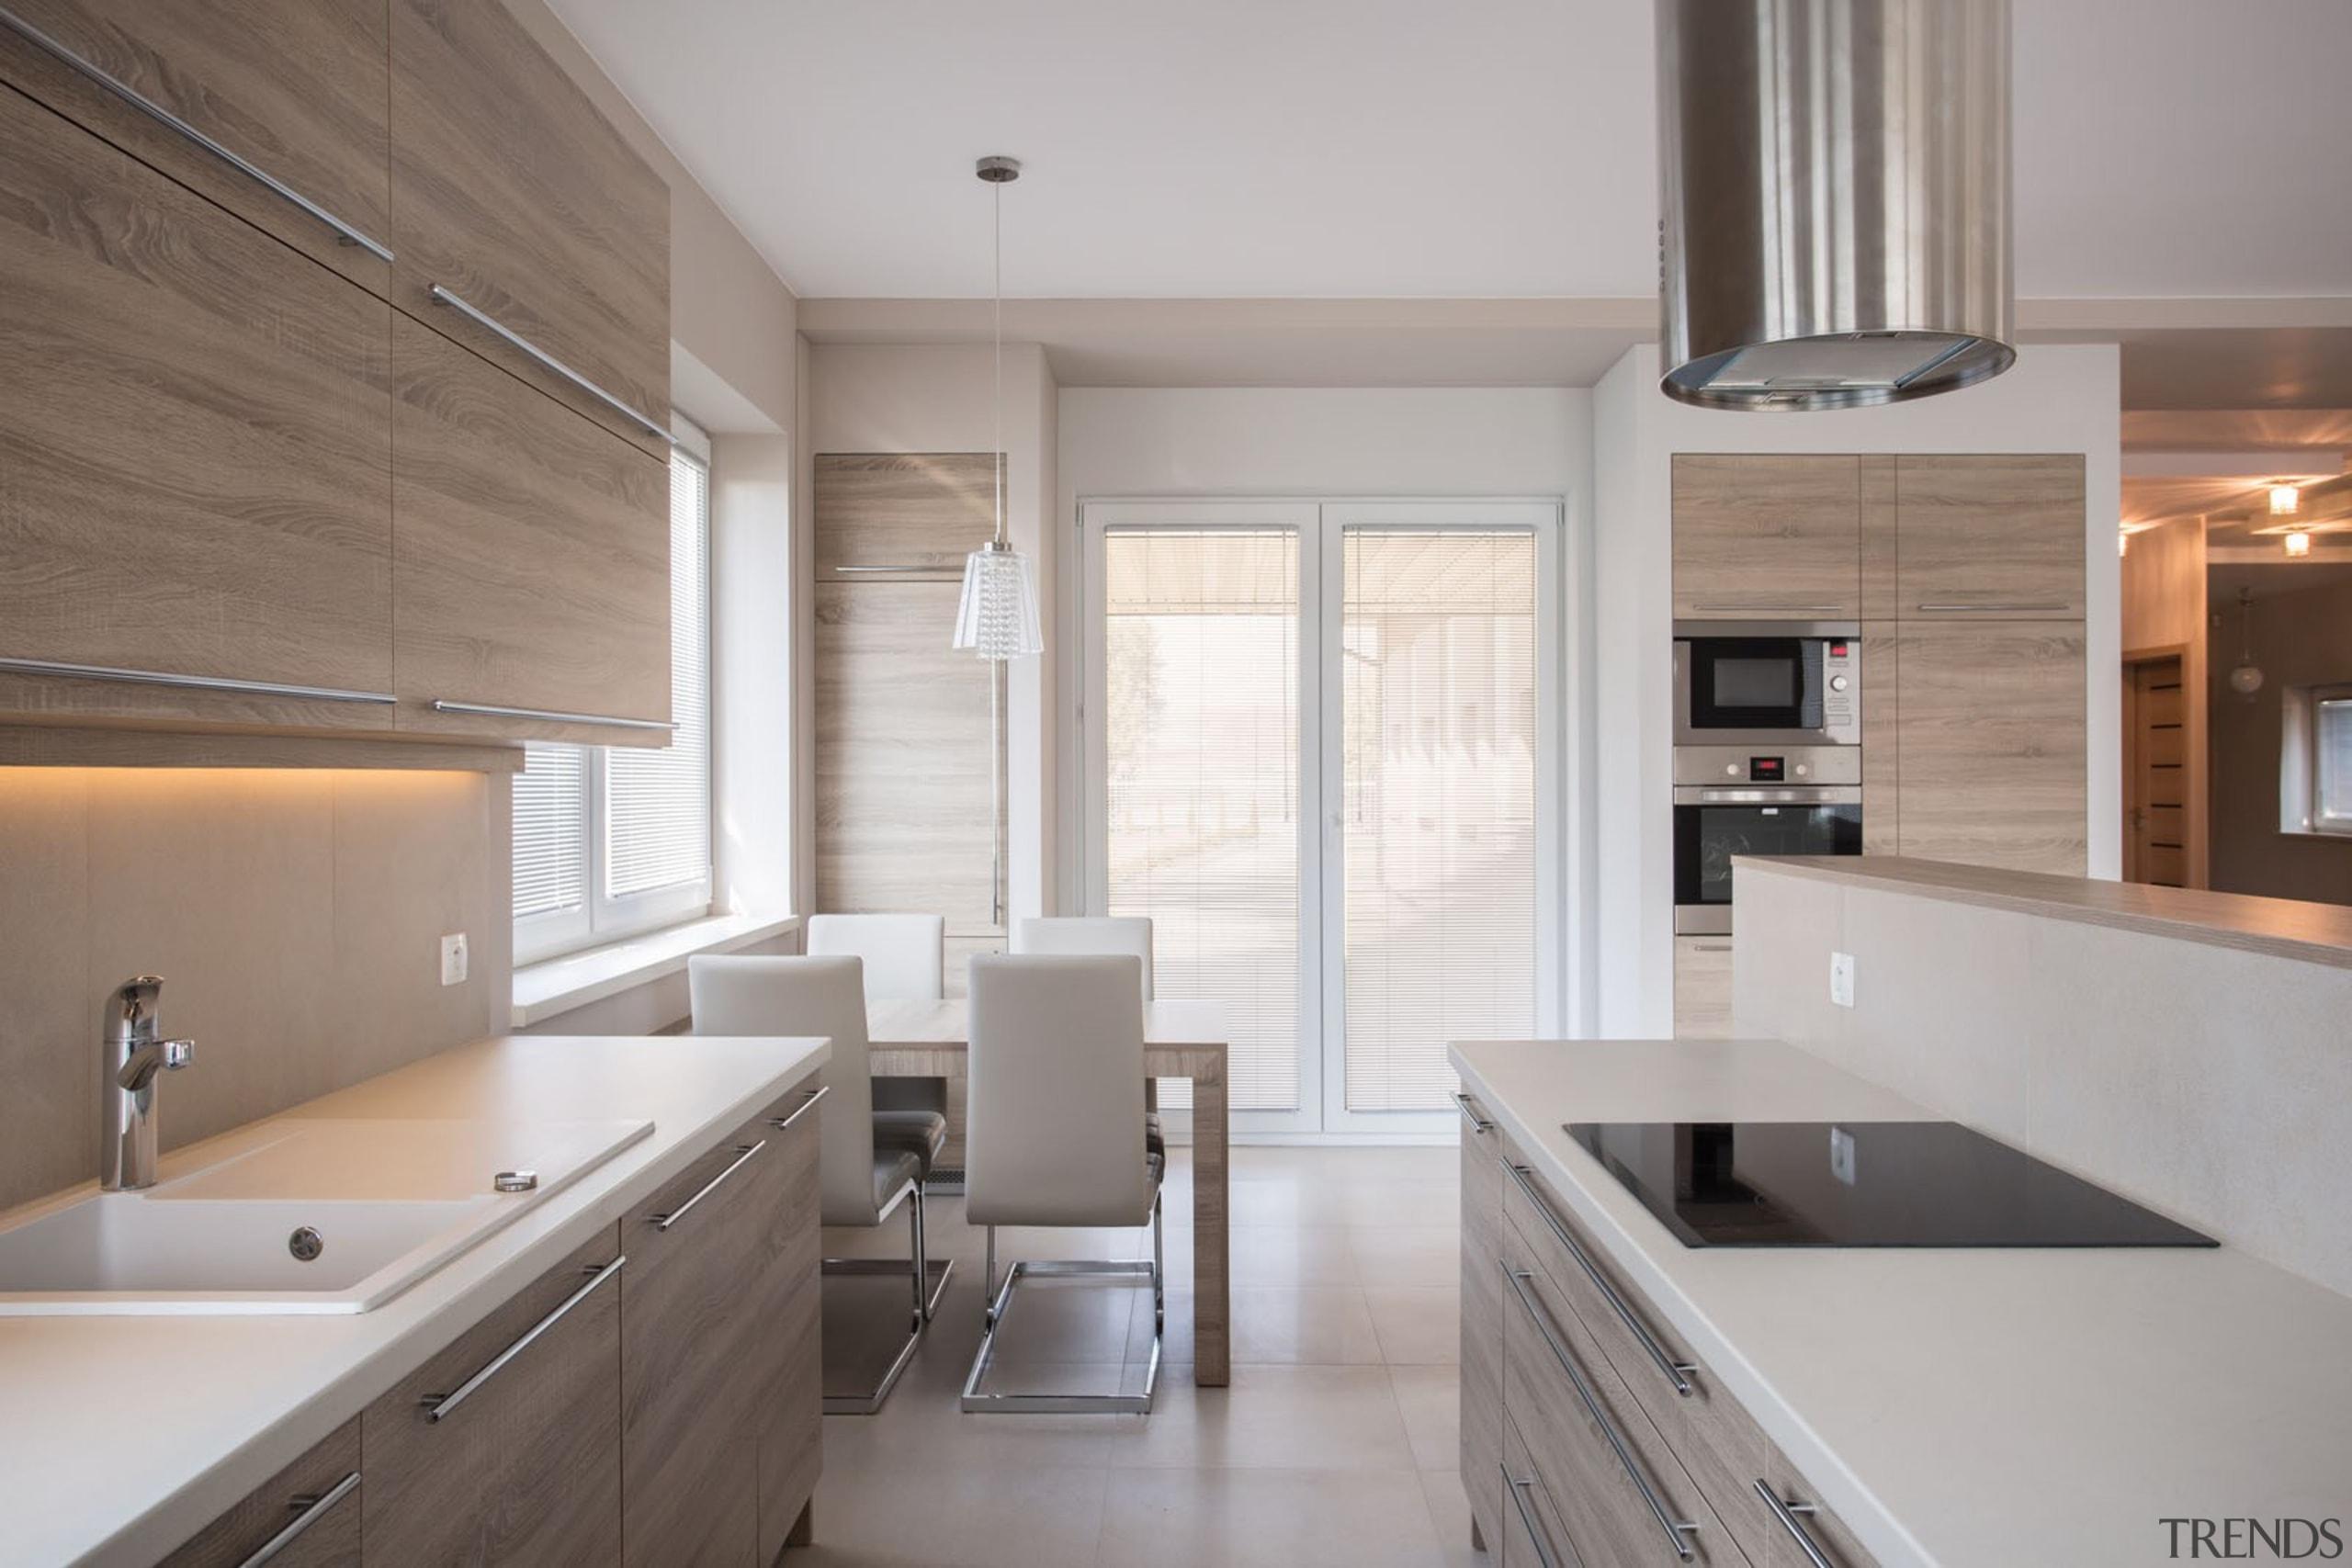 Silestone Kitchen - Coral Clay - Suede - cabinetry, countertop, cuisine classique, floor, flooring, interior design, kitchen, real estate, room, wood flooring, gray